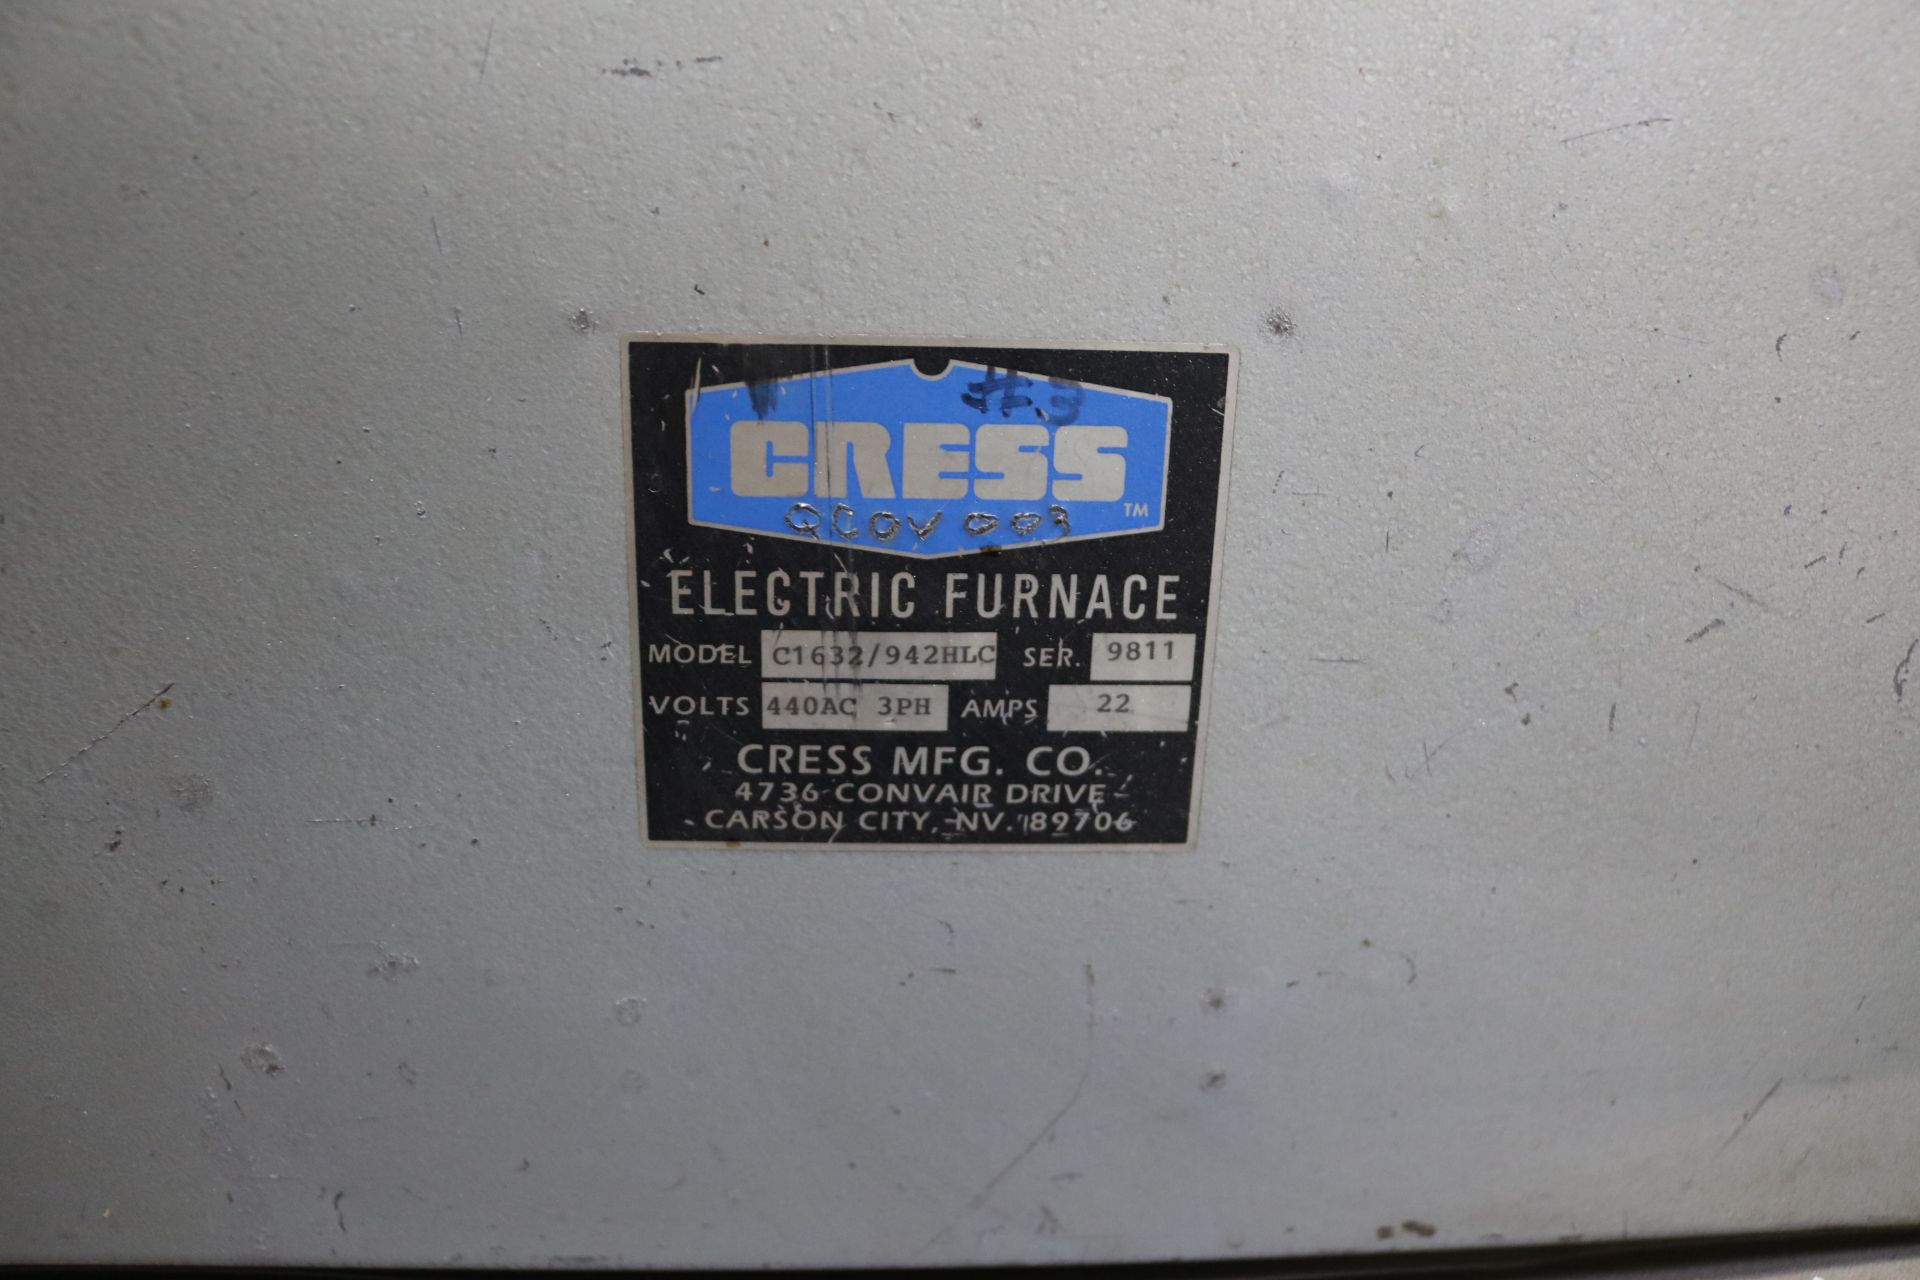 Lot 26 - CRESS ELECTRIC FURNACE, MODEL C1632/942 HLC, S/N 9811